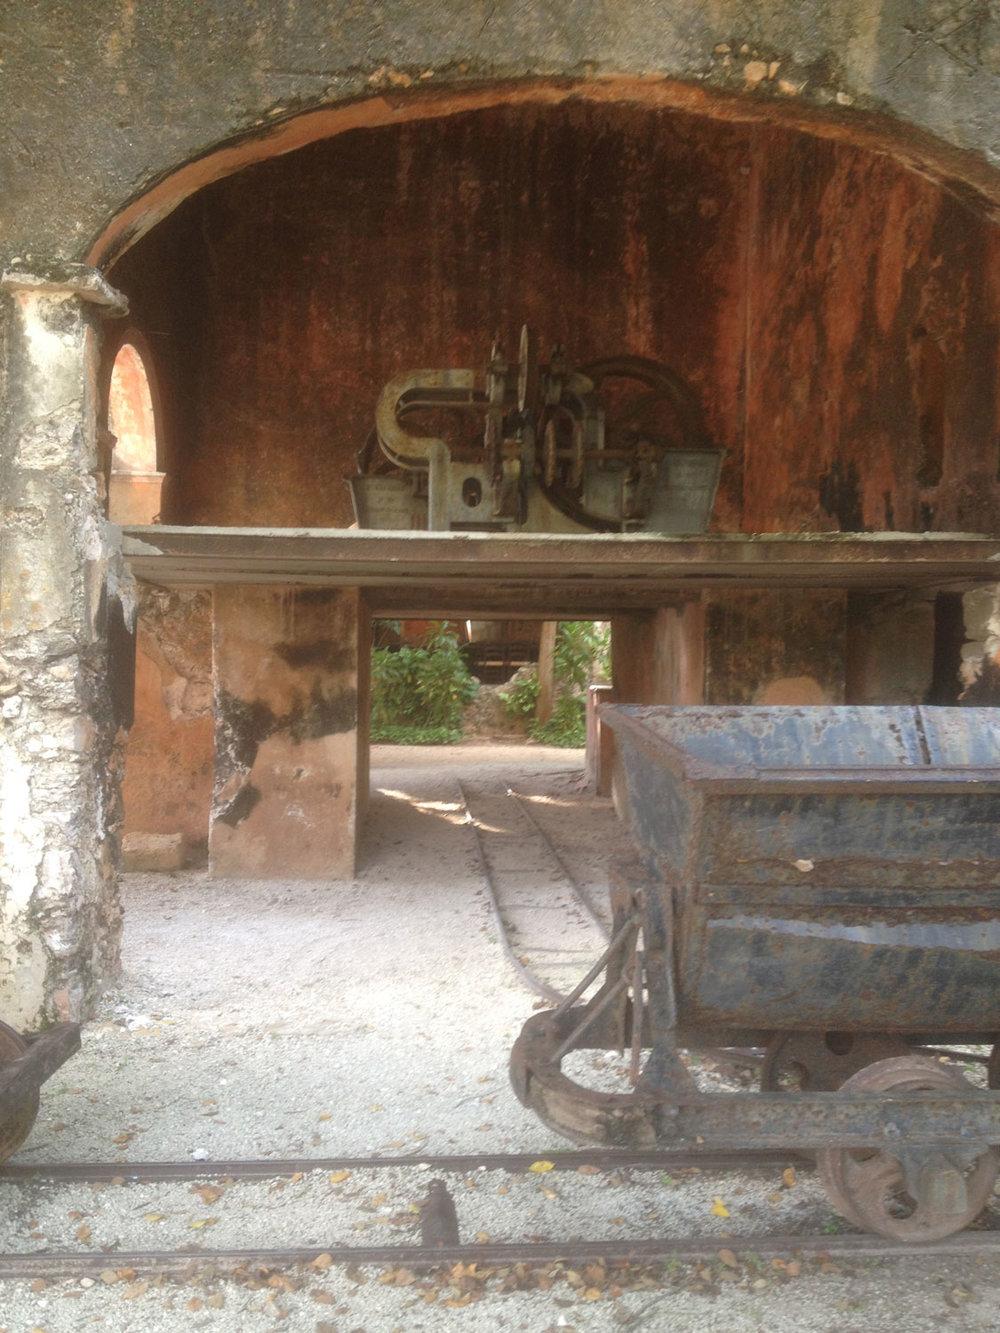 Hammocks_and_Ruins_Blog_Riviera_Maya_Mexico_Travel_Discover_Yucatan_What_to_do_Hacienda_Ochil_24.jpg